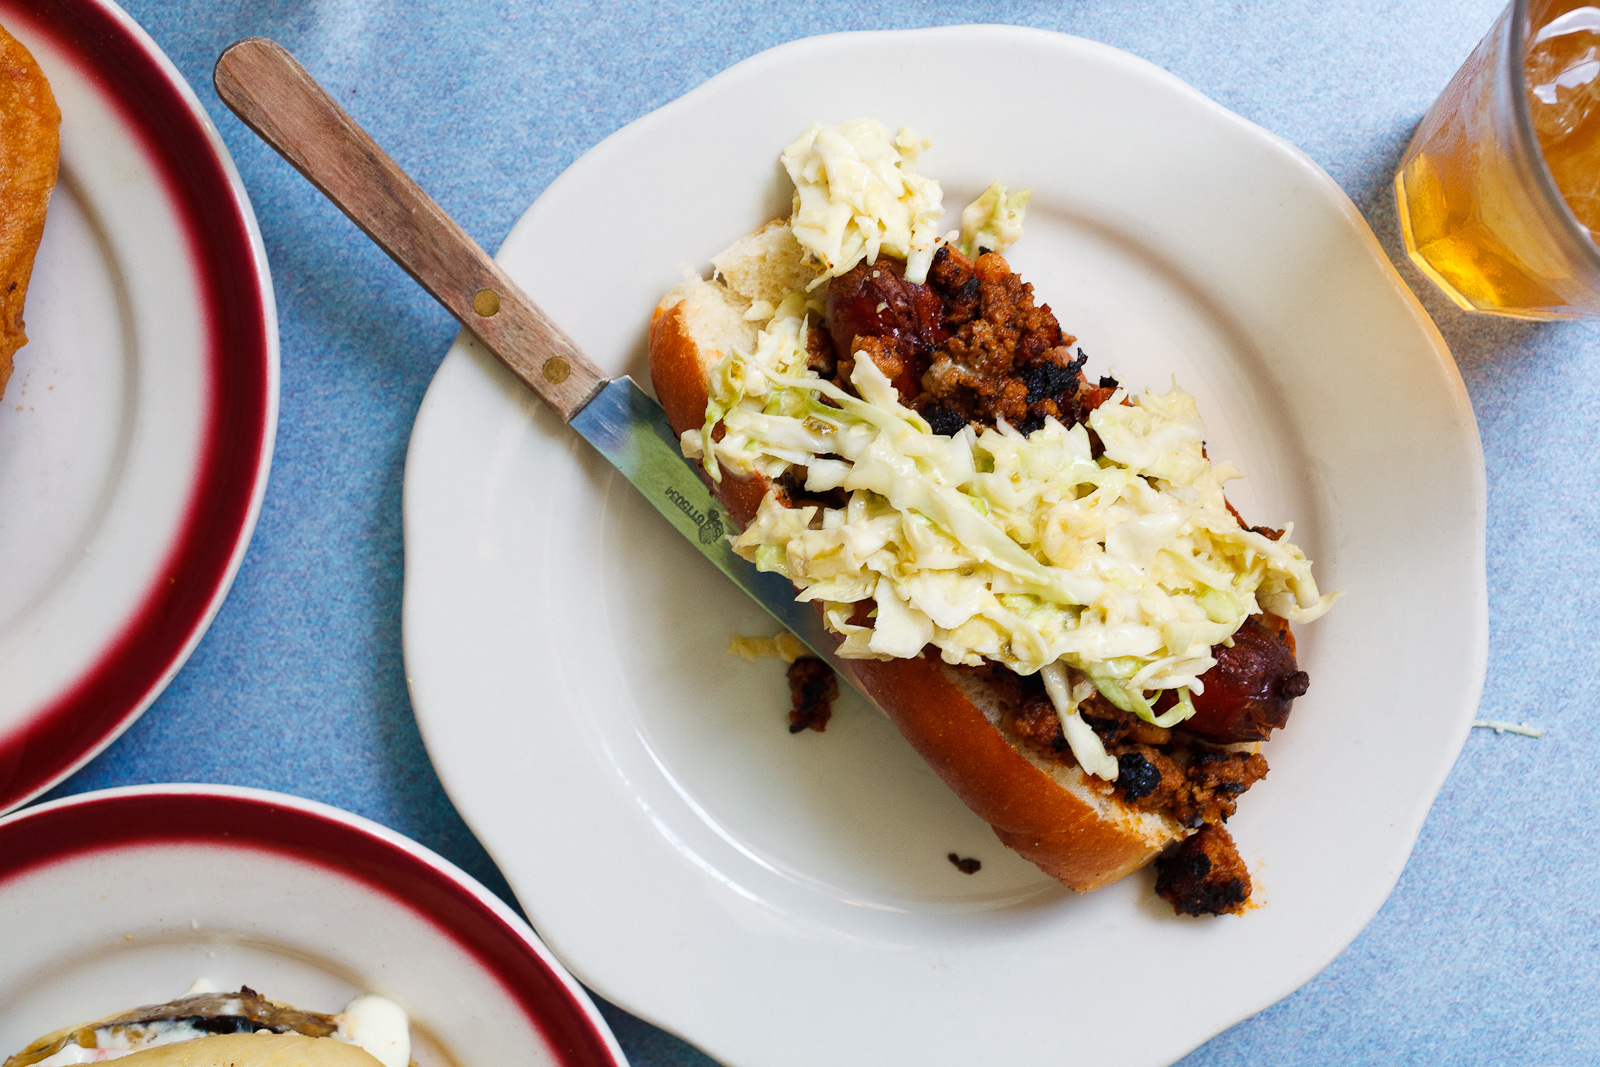 Hot Dog, Sweet Bacon Chili, Coleslaw ($6)